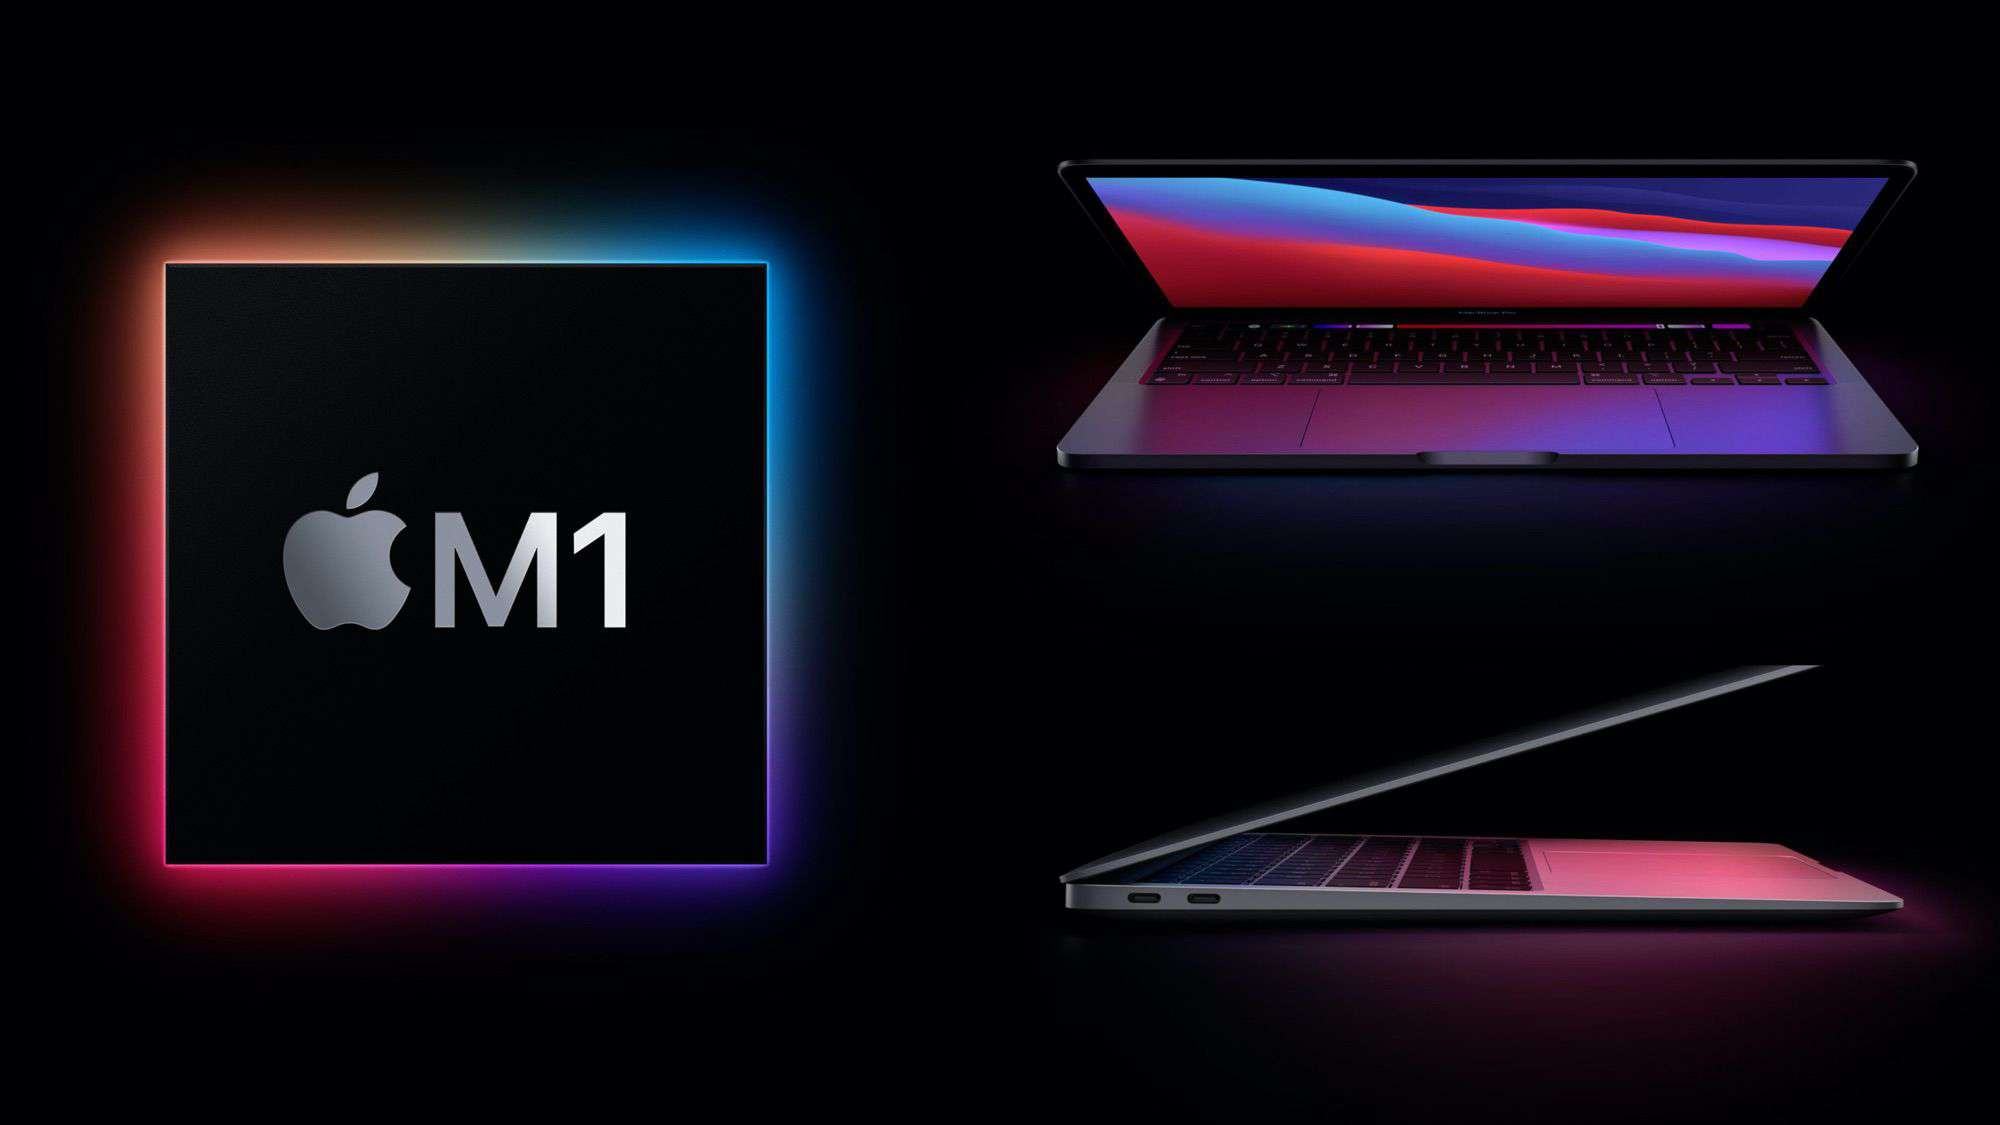 MacBook Apple M1